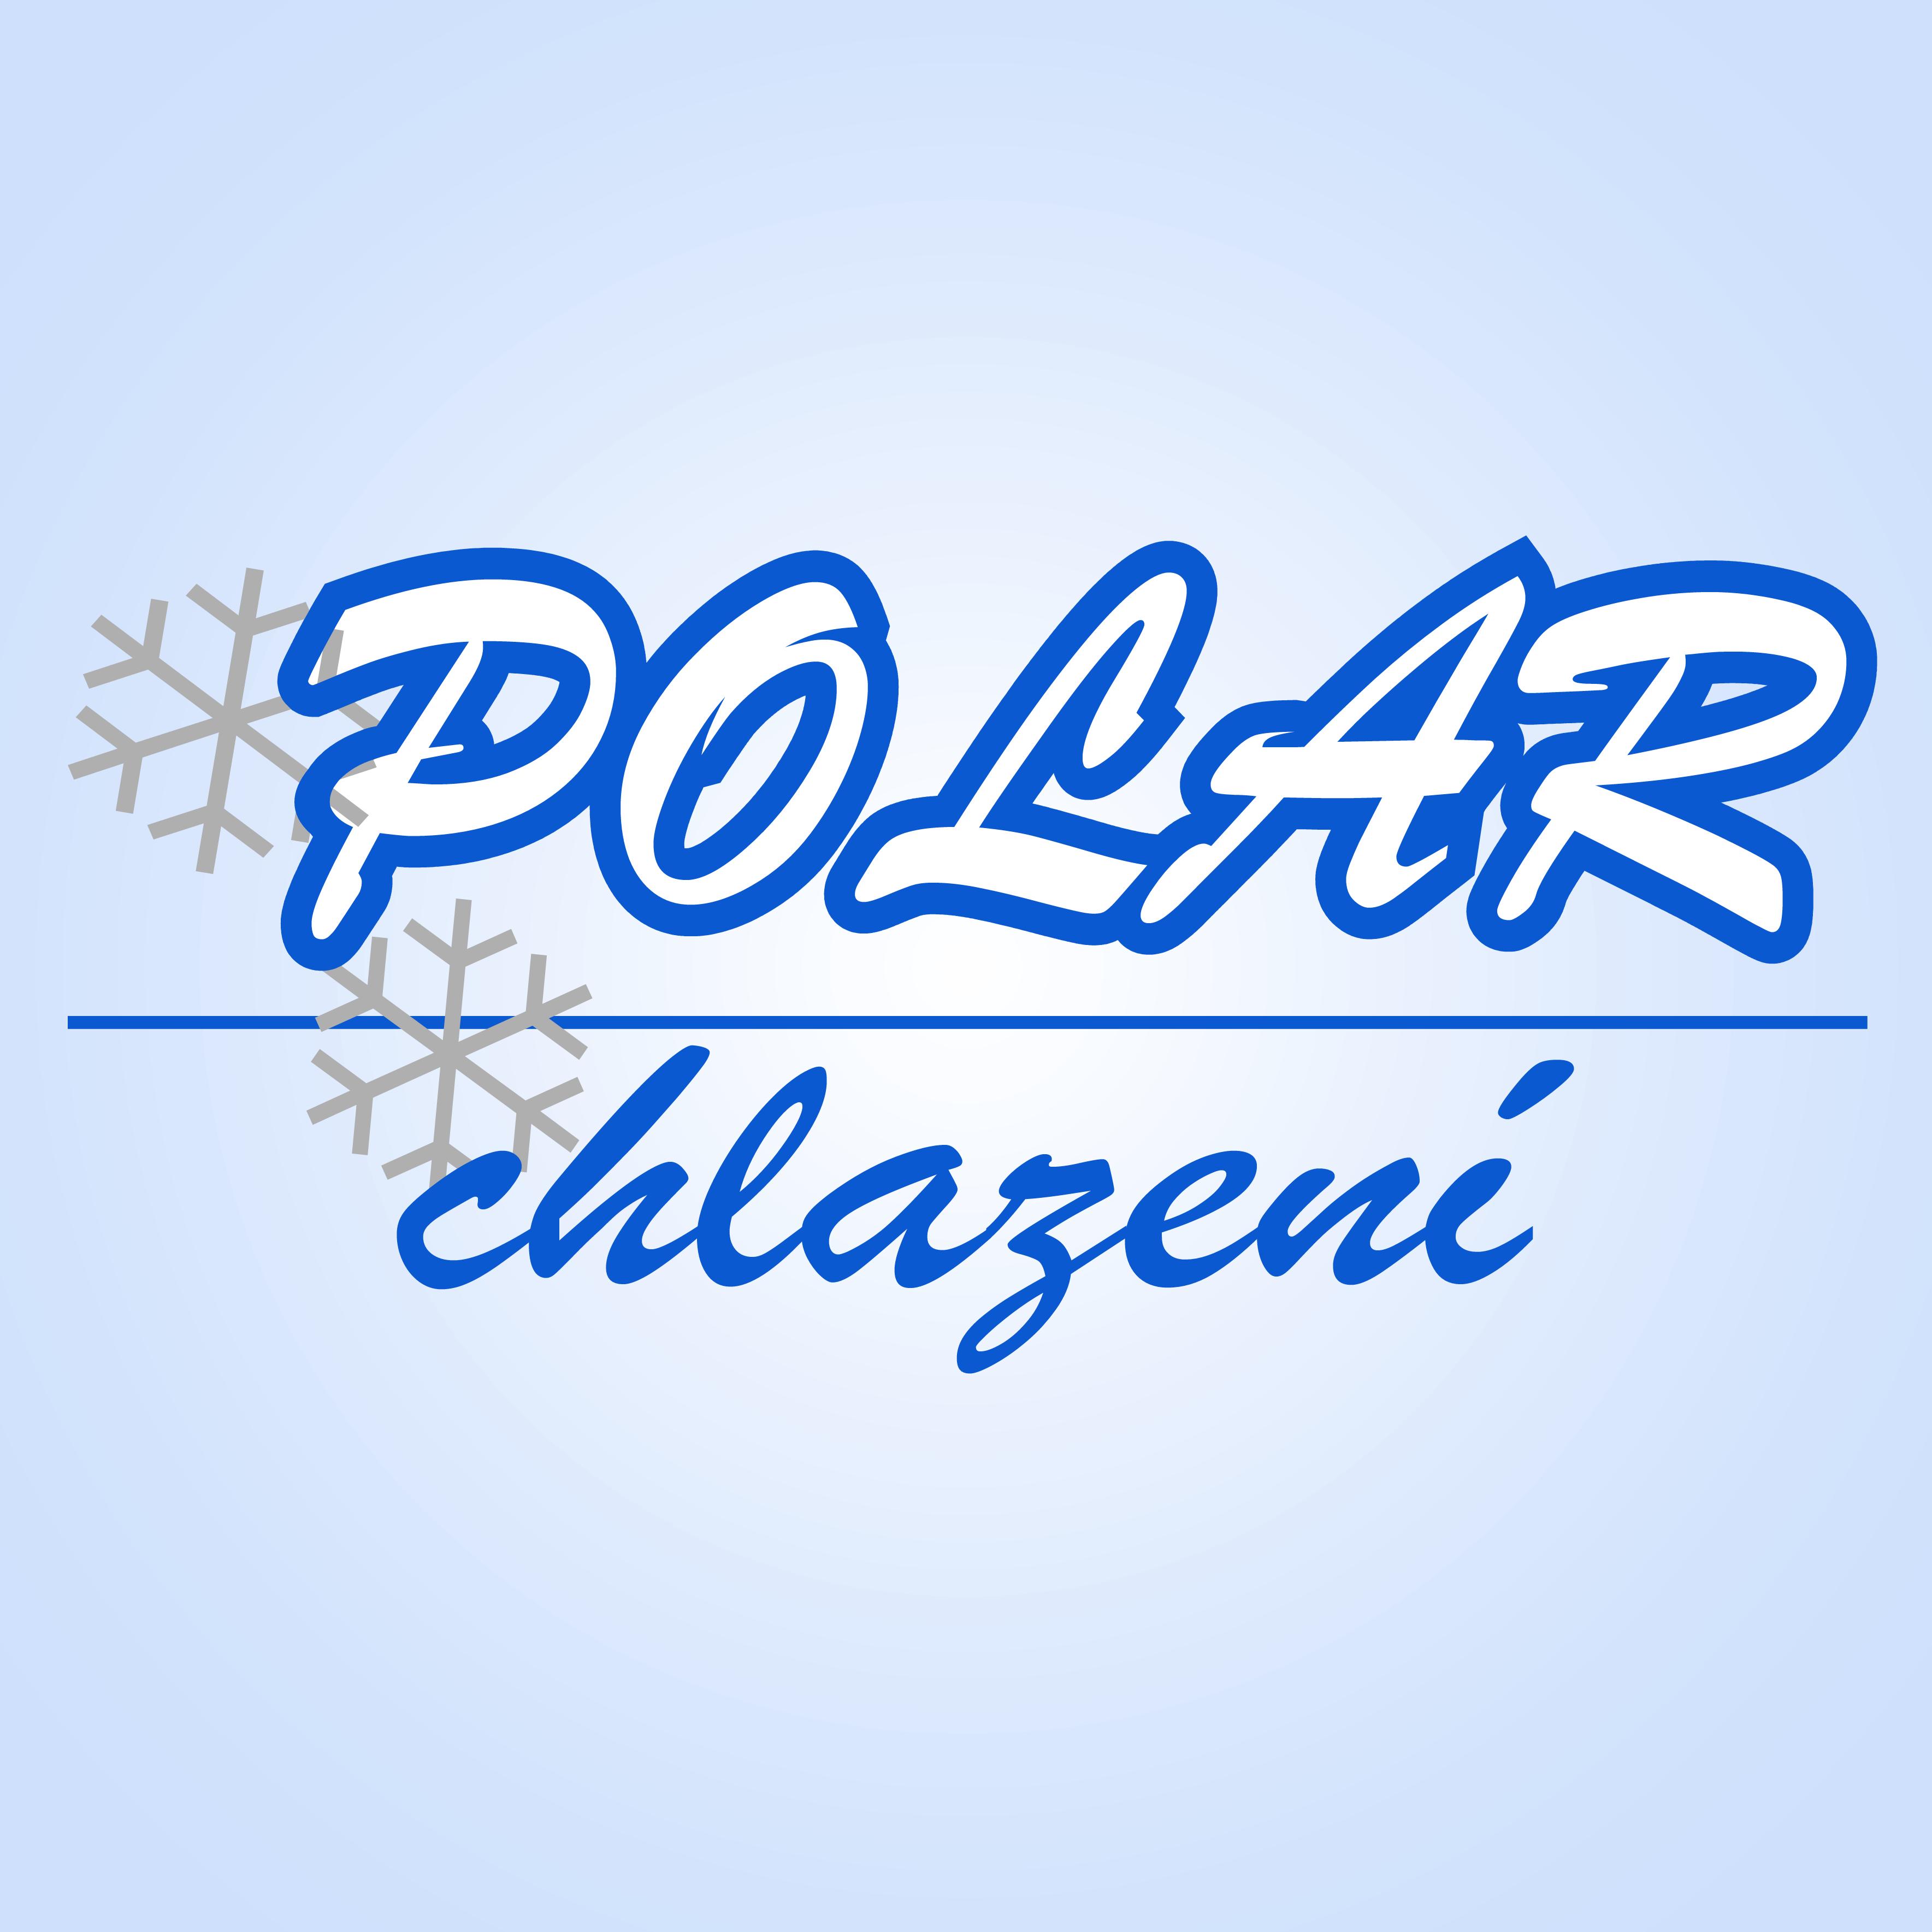 Polar chlazení